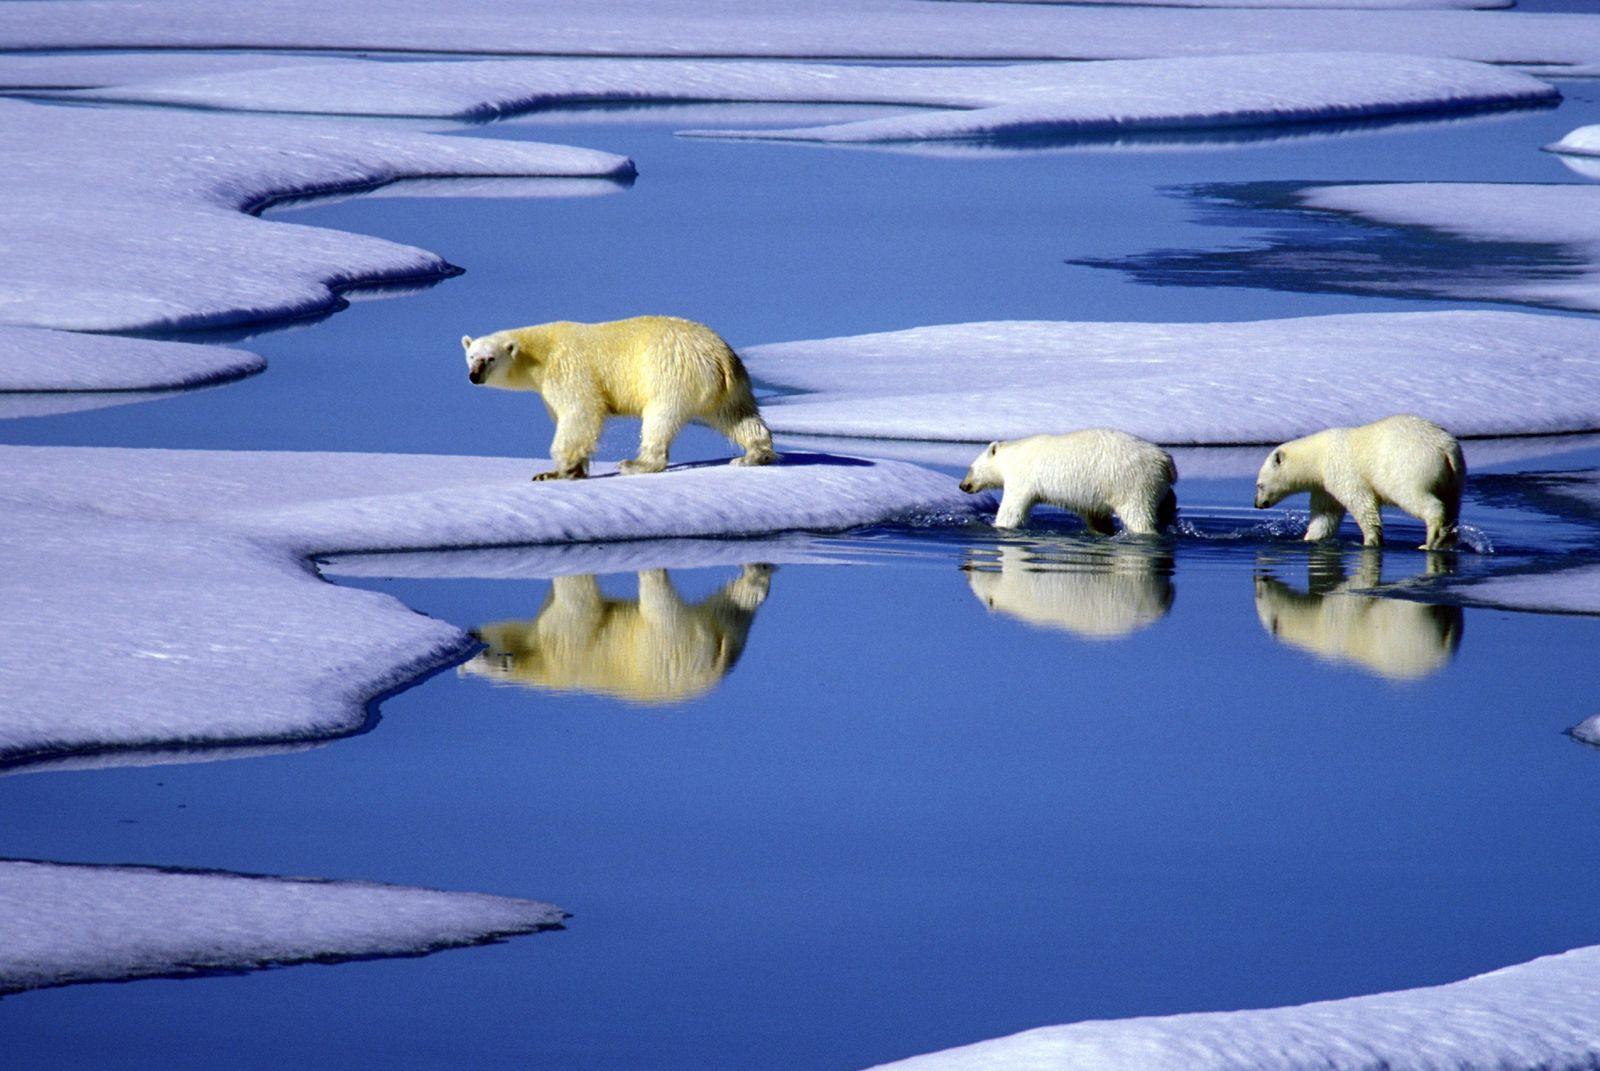 Eisbärenfamilie / Eisbär / Polarschmelze / Kanada Chronik 2009 Klima #6